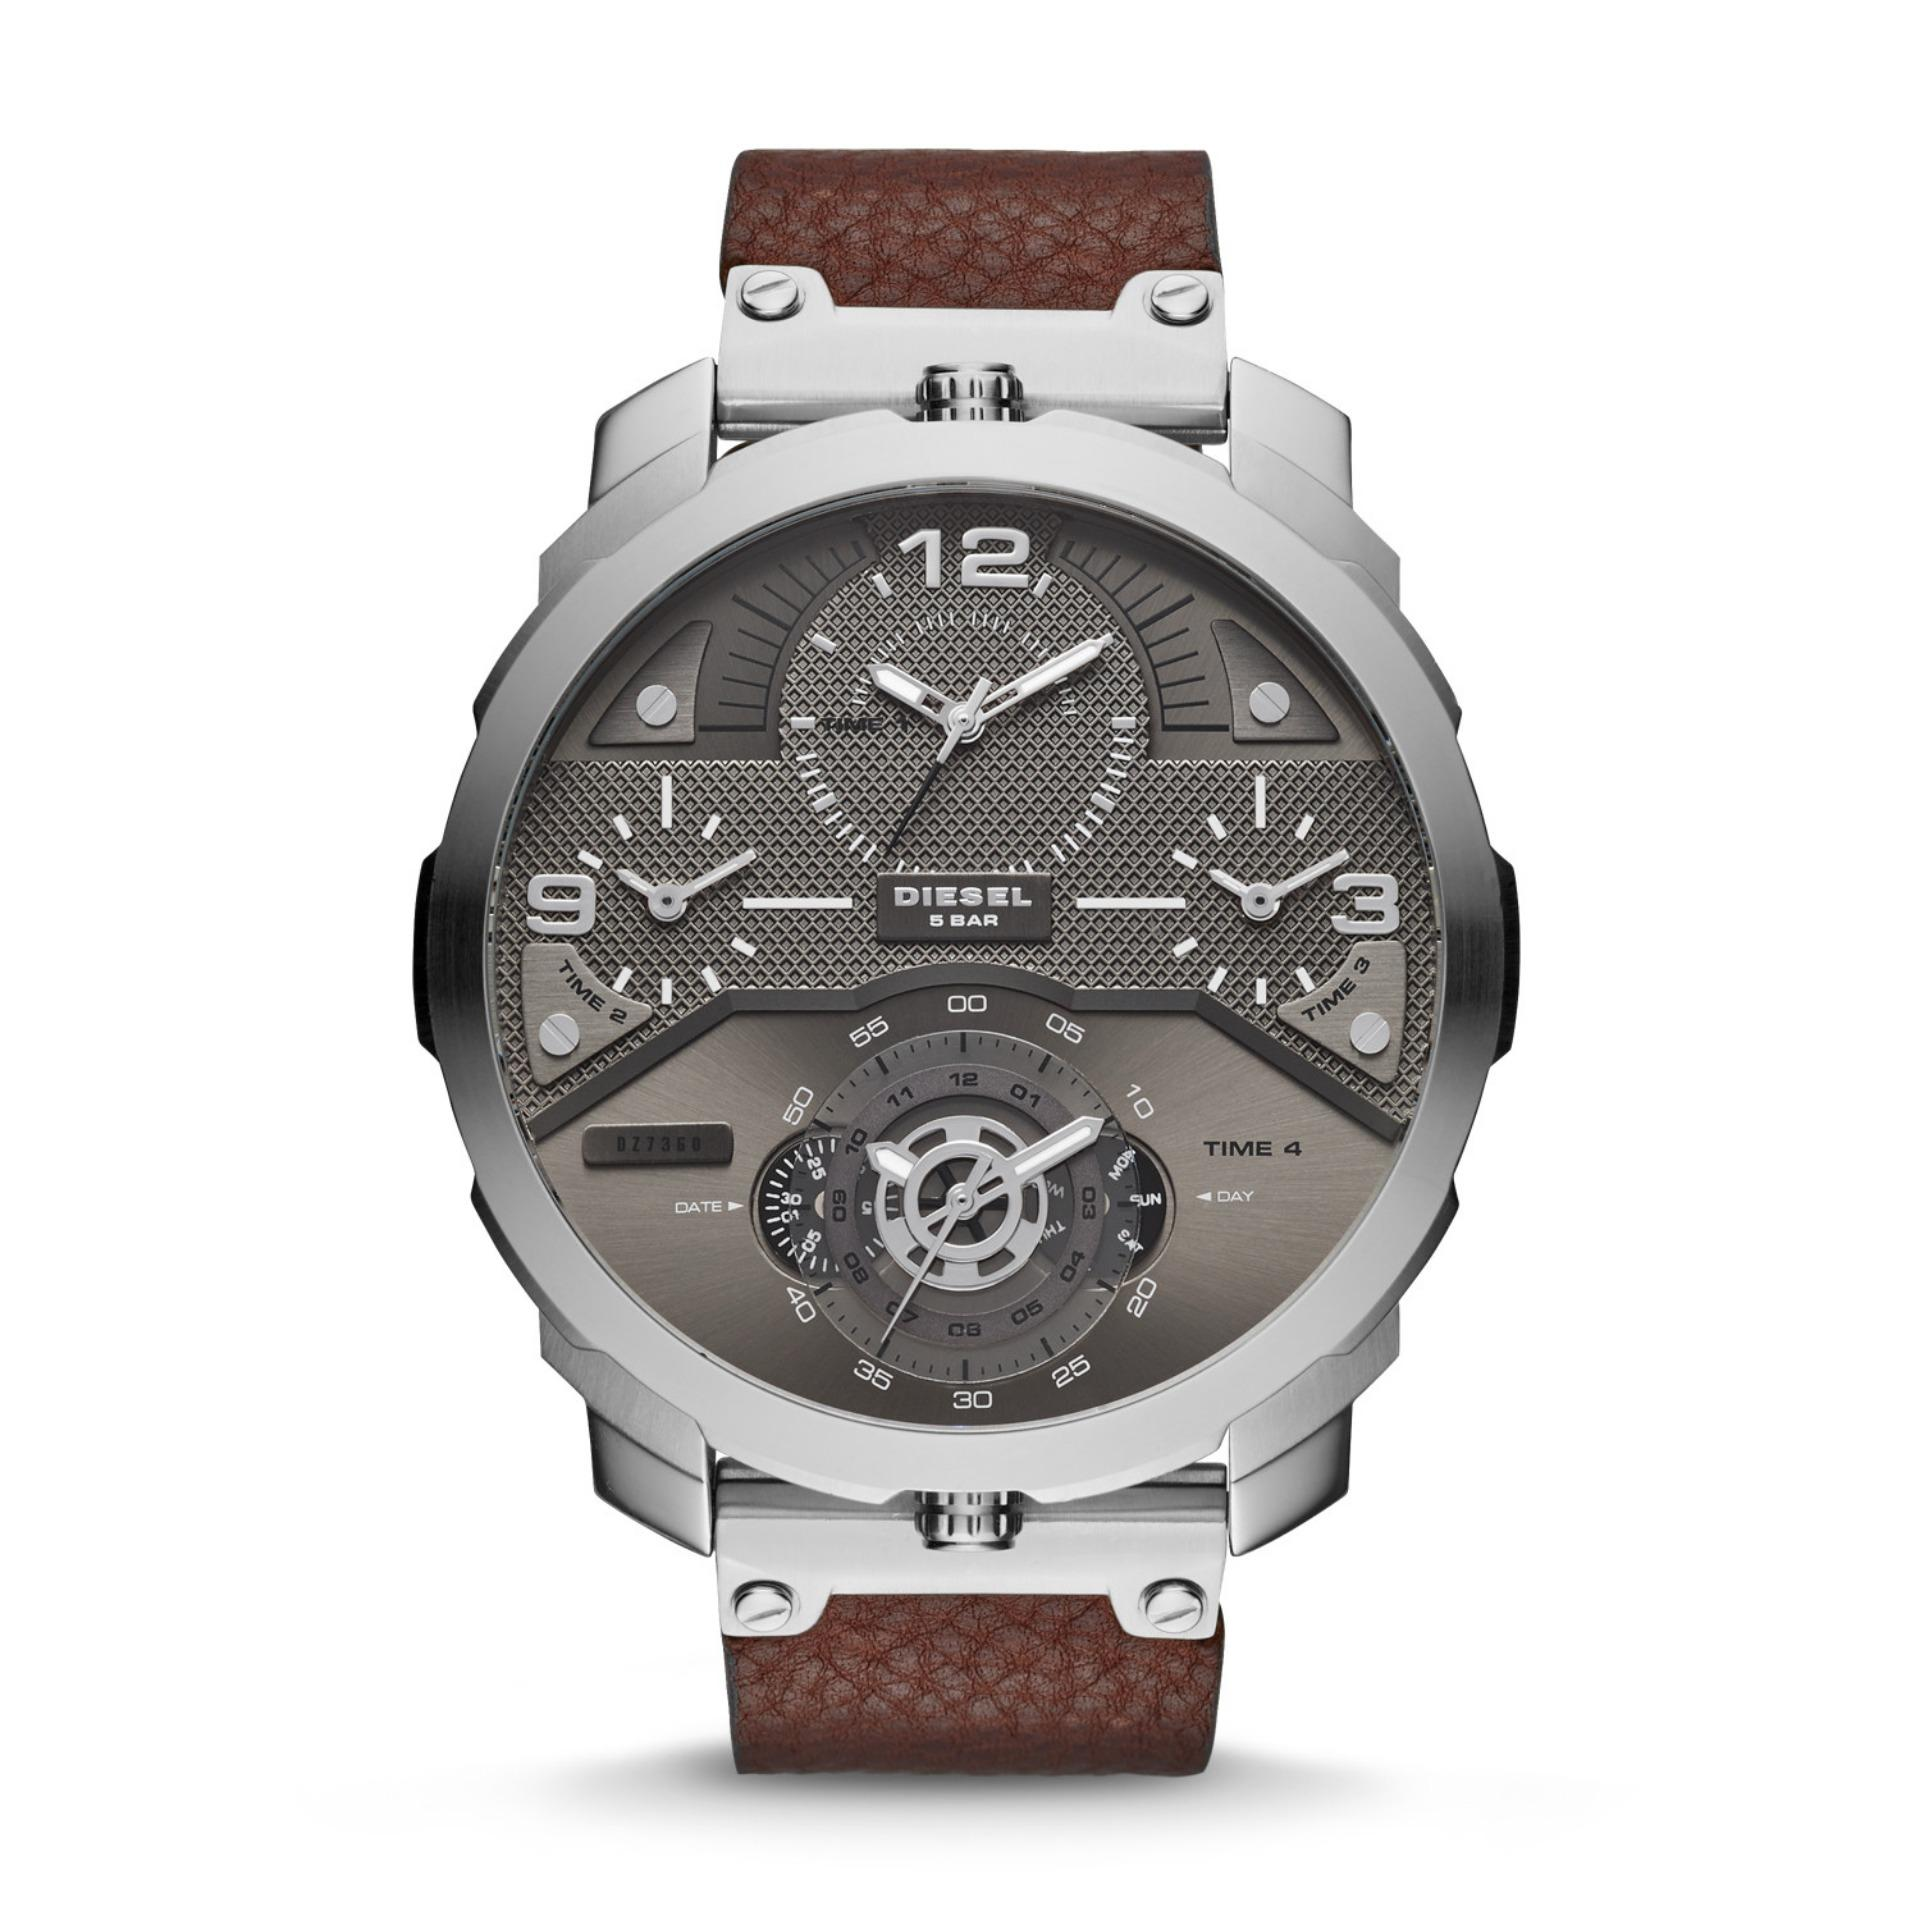 Diesel SBA Machinus - Gray Round Dial 55mm - Leather Strap - Dark Brown - Jam Tangan Pria - DZ7360 - SL